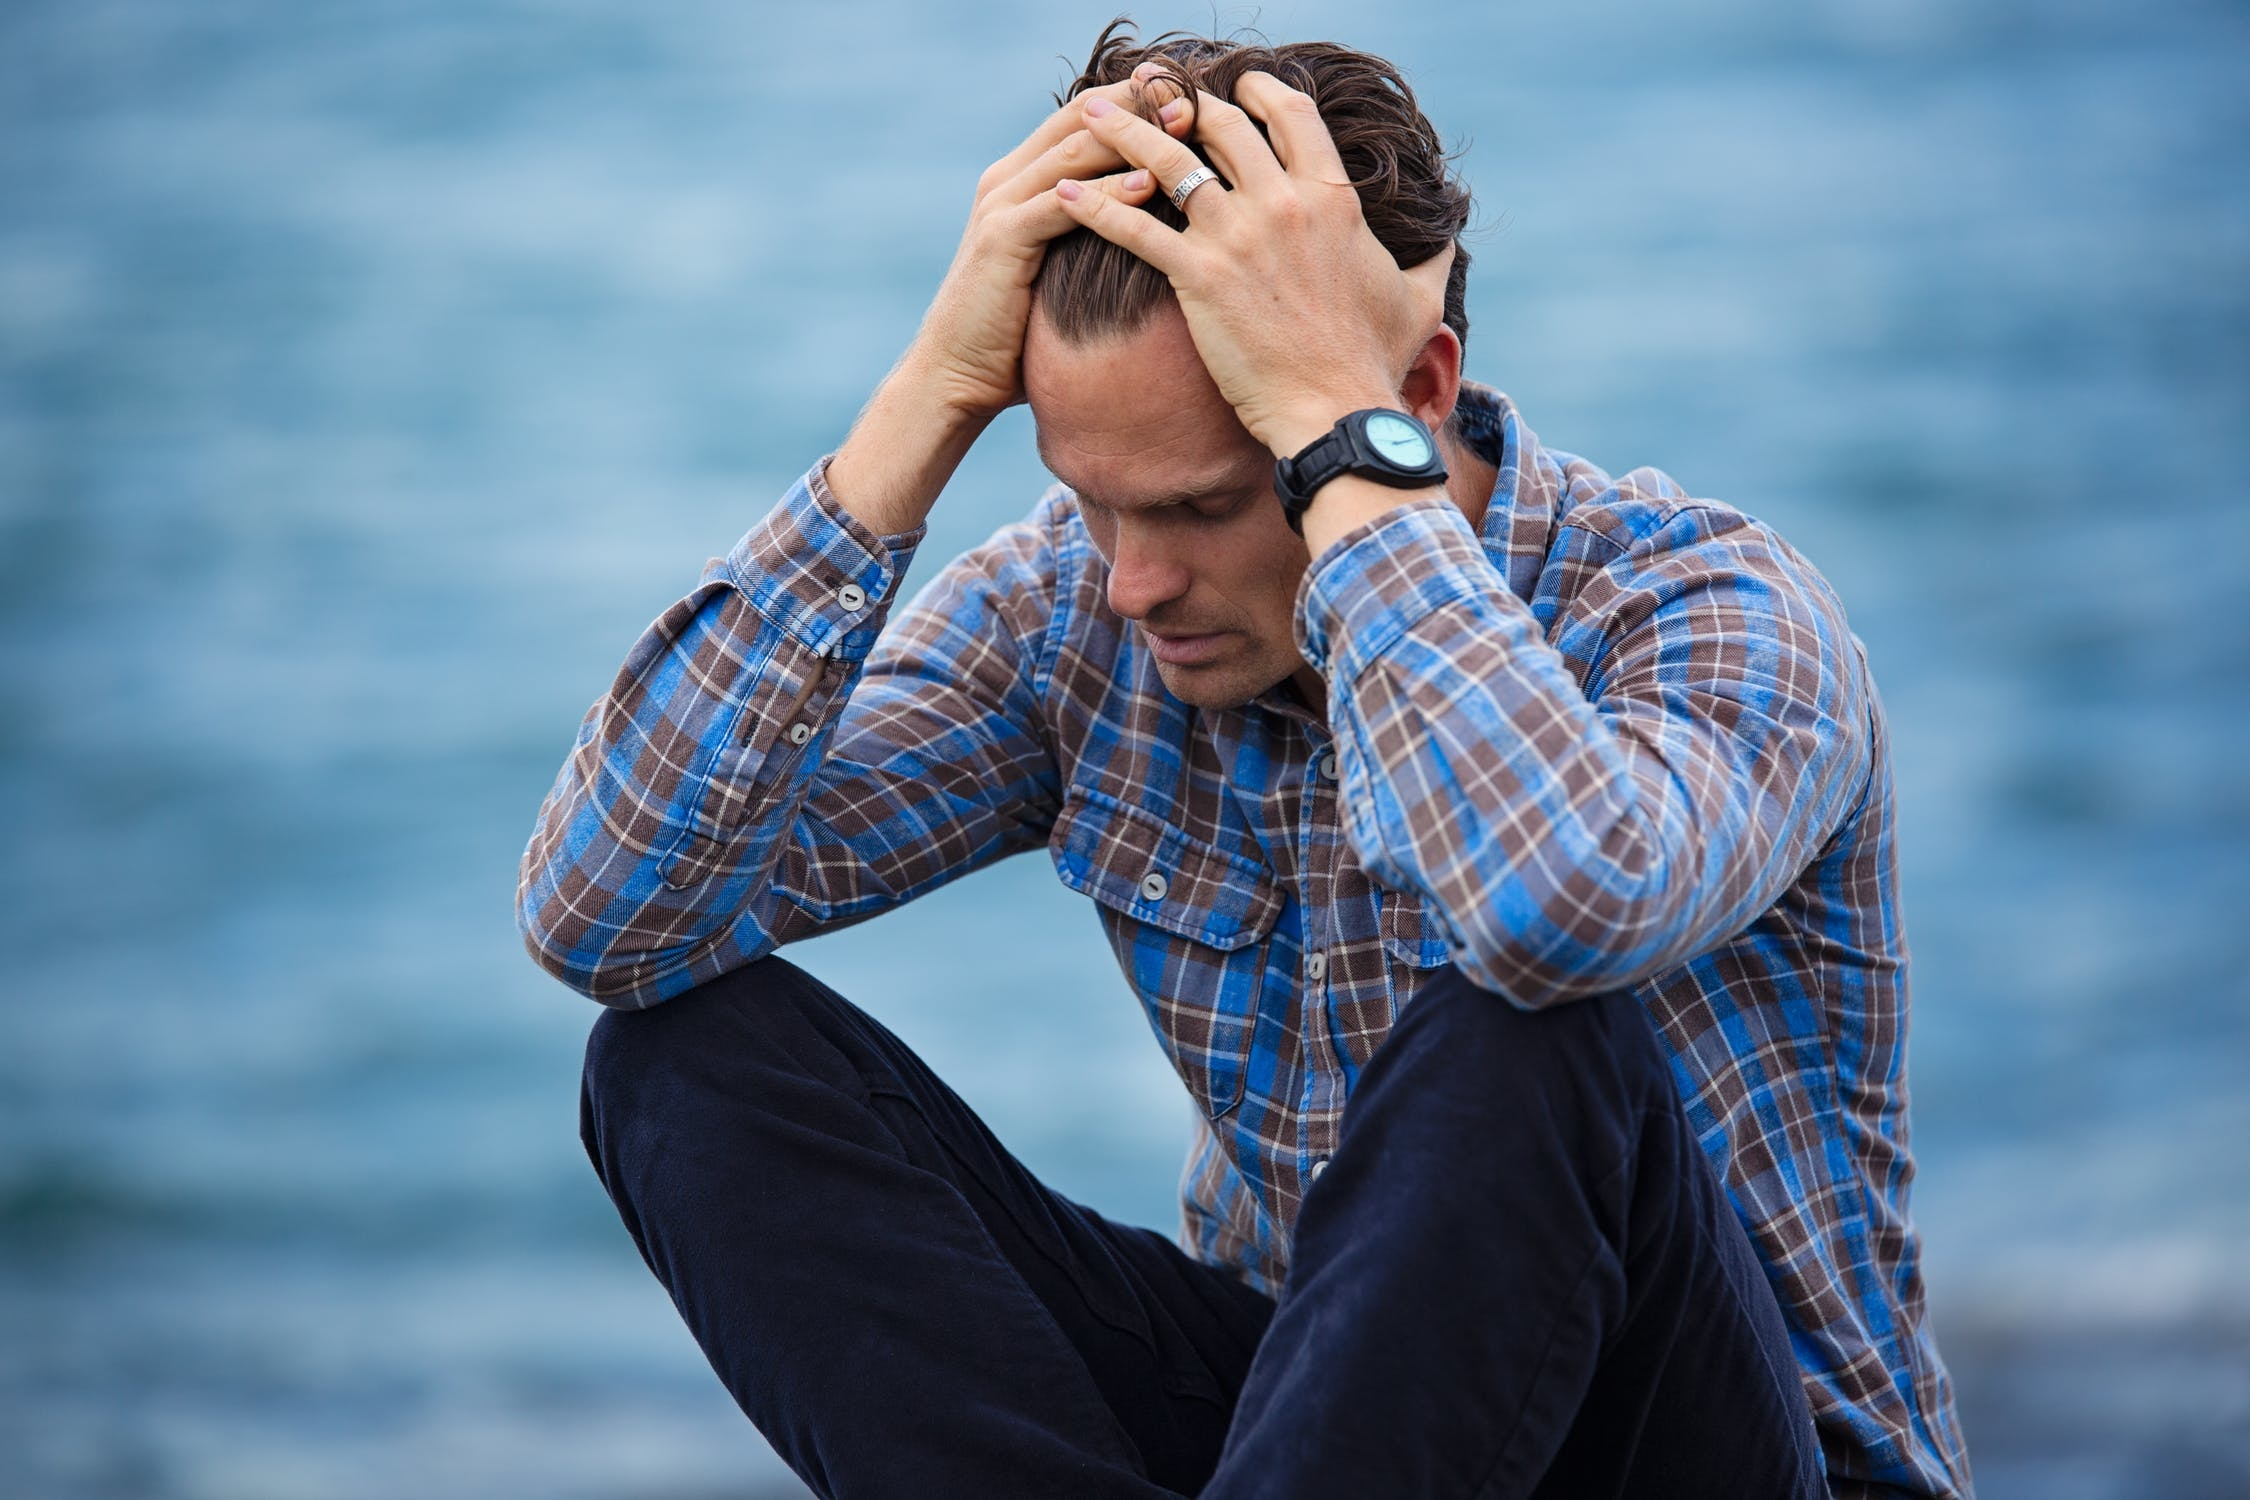 Paranoia is a key symptom of anxiety